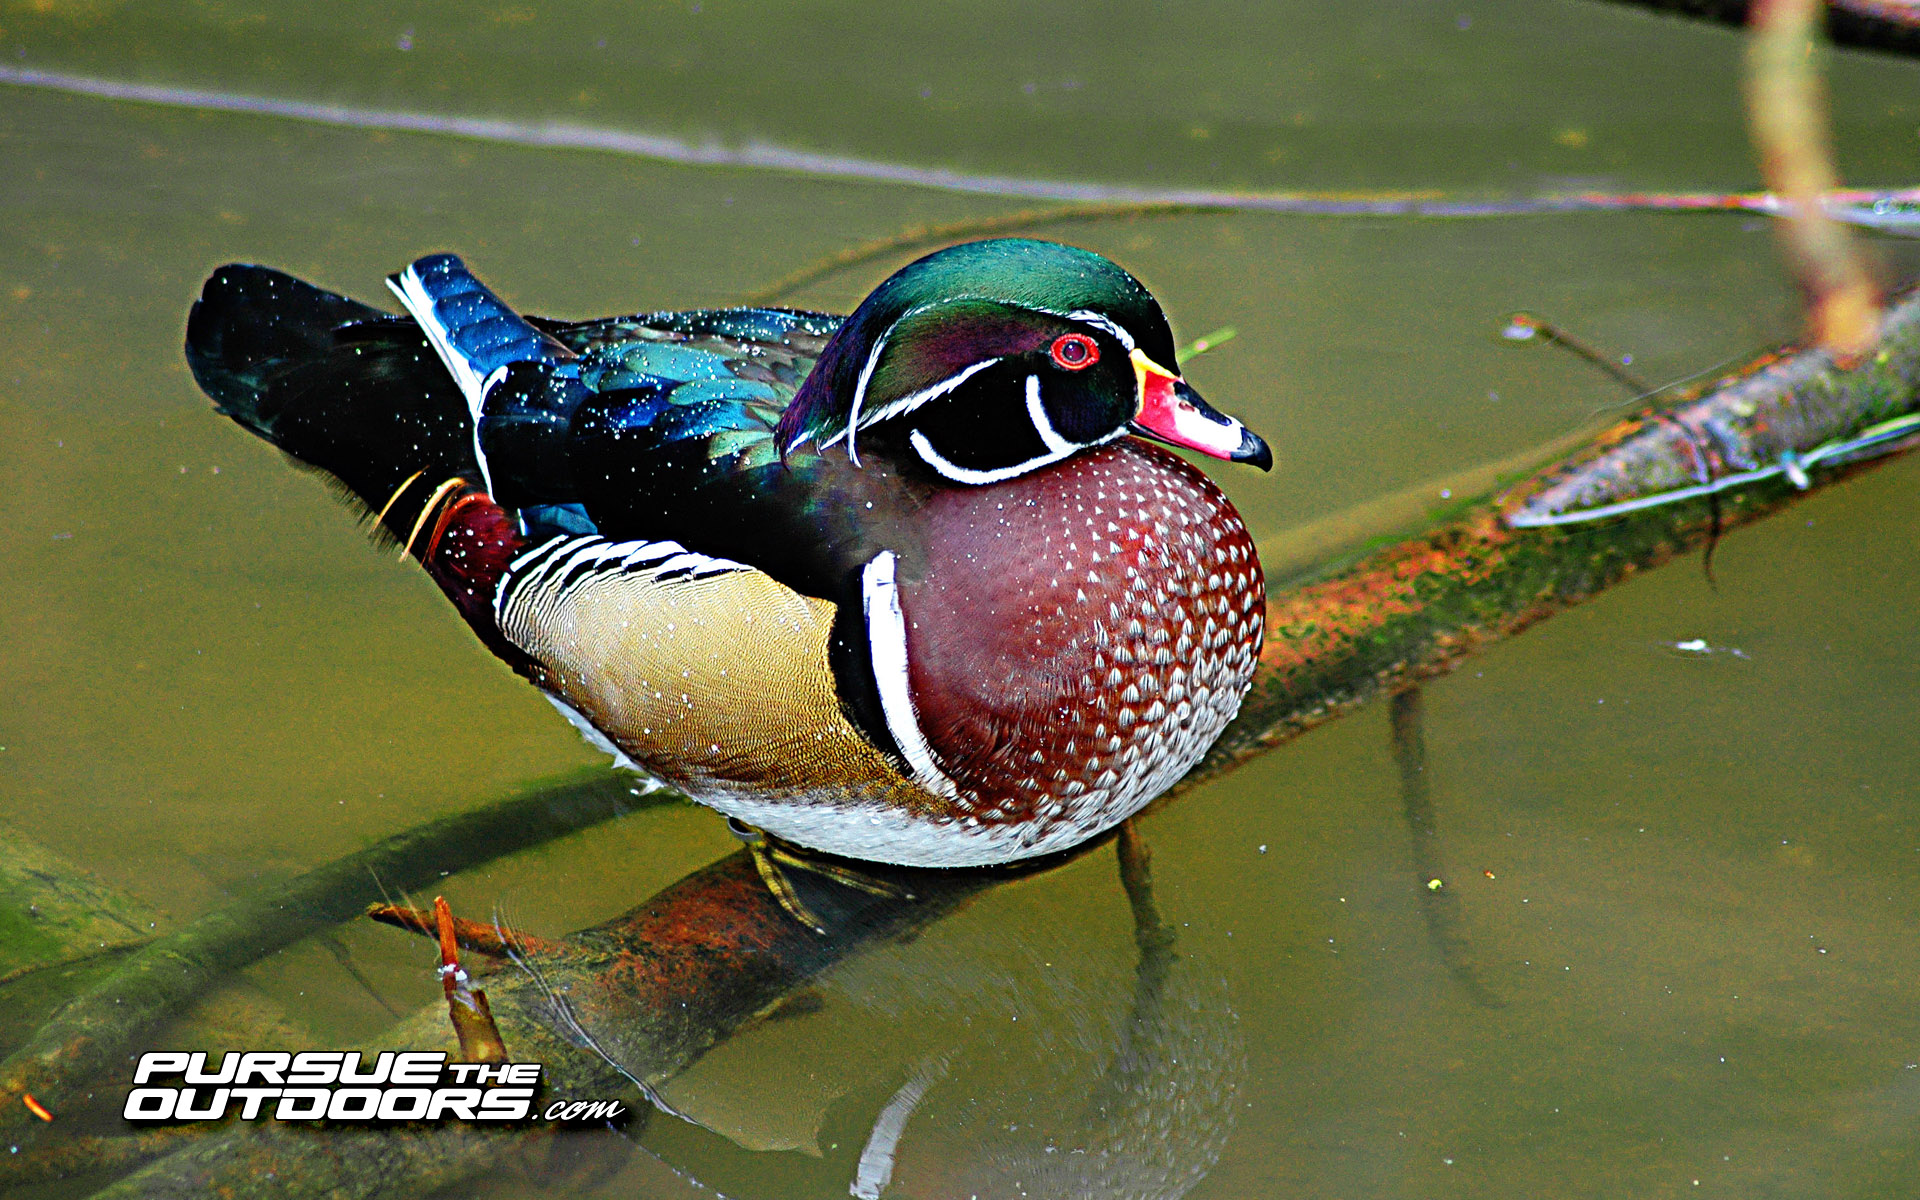 [45+] Duck Hunting Wallpapers For Desktop On WallpaperSafari